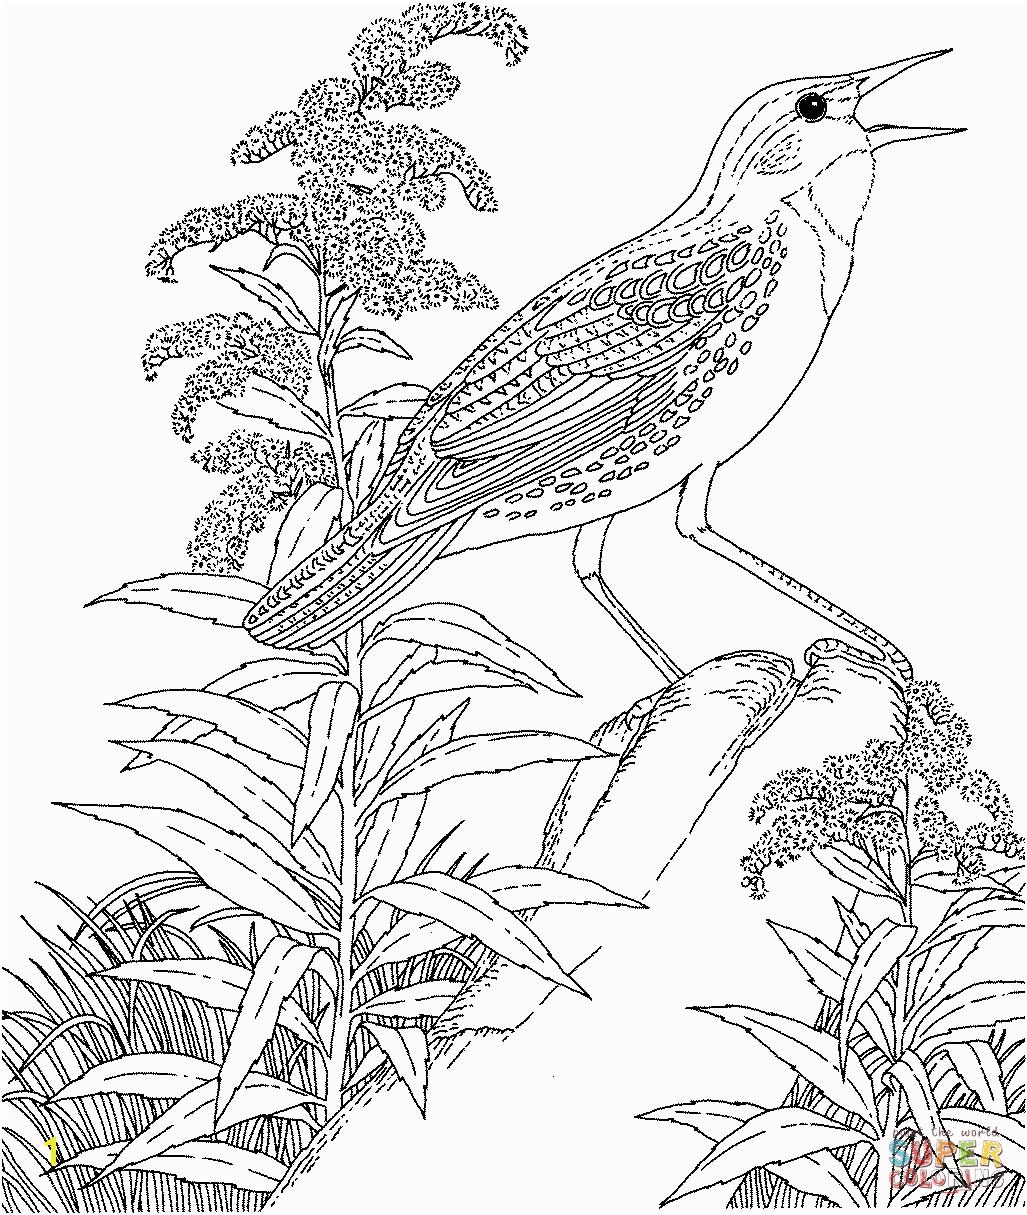 Meadowlark and Wild Sunflower Kansas State Bird and Flower